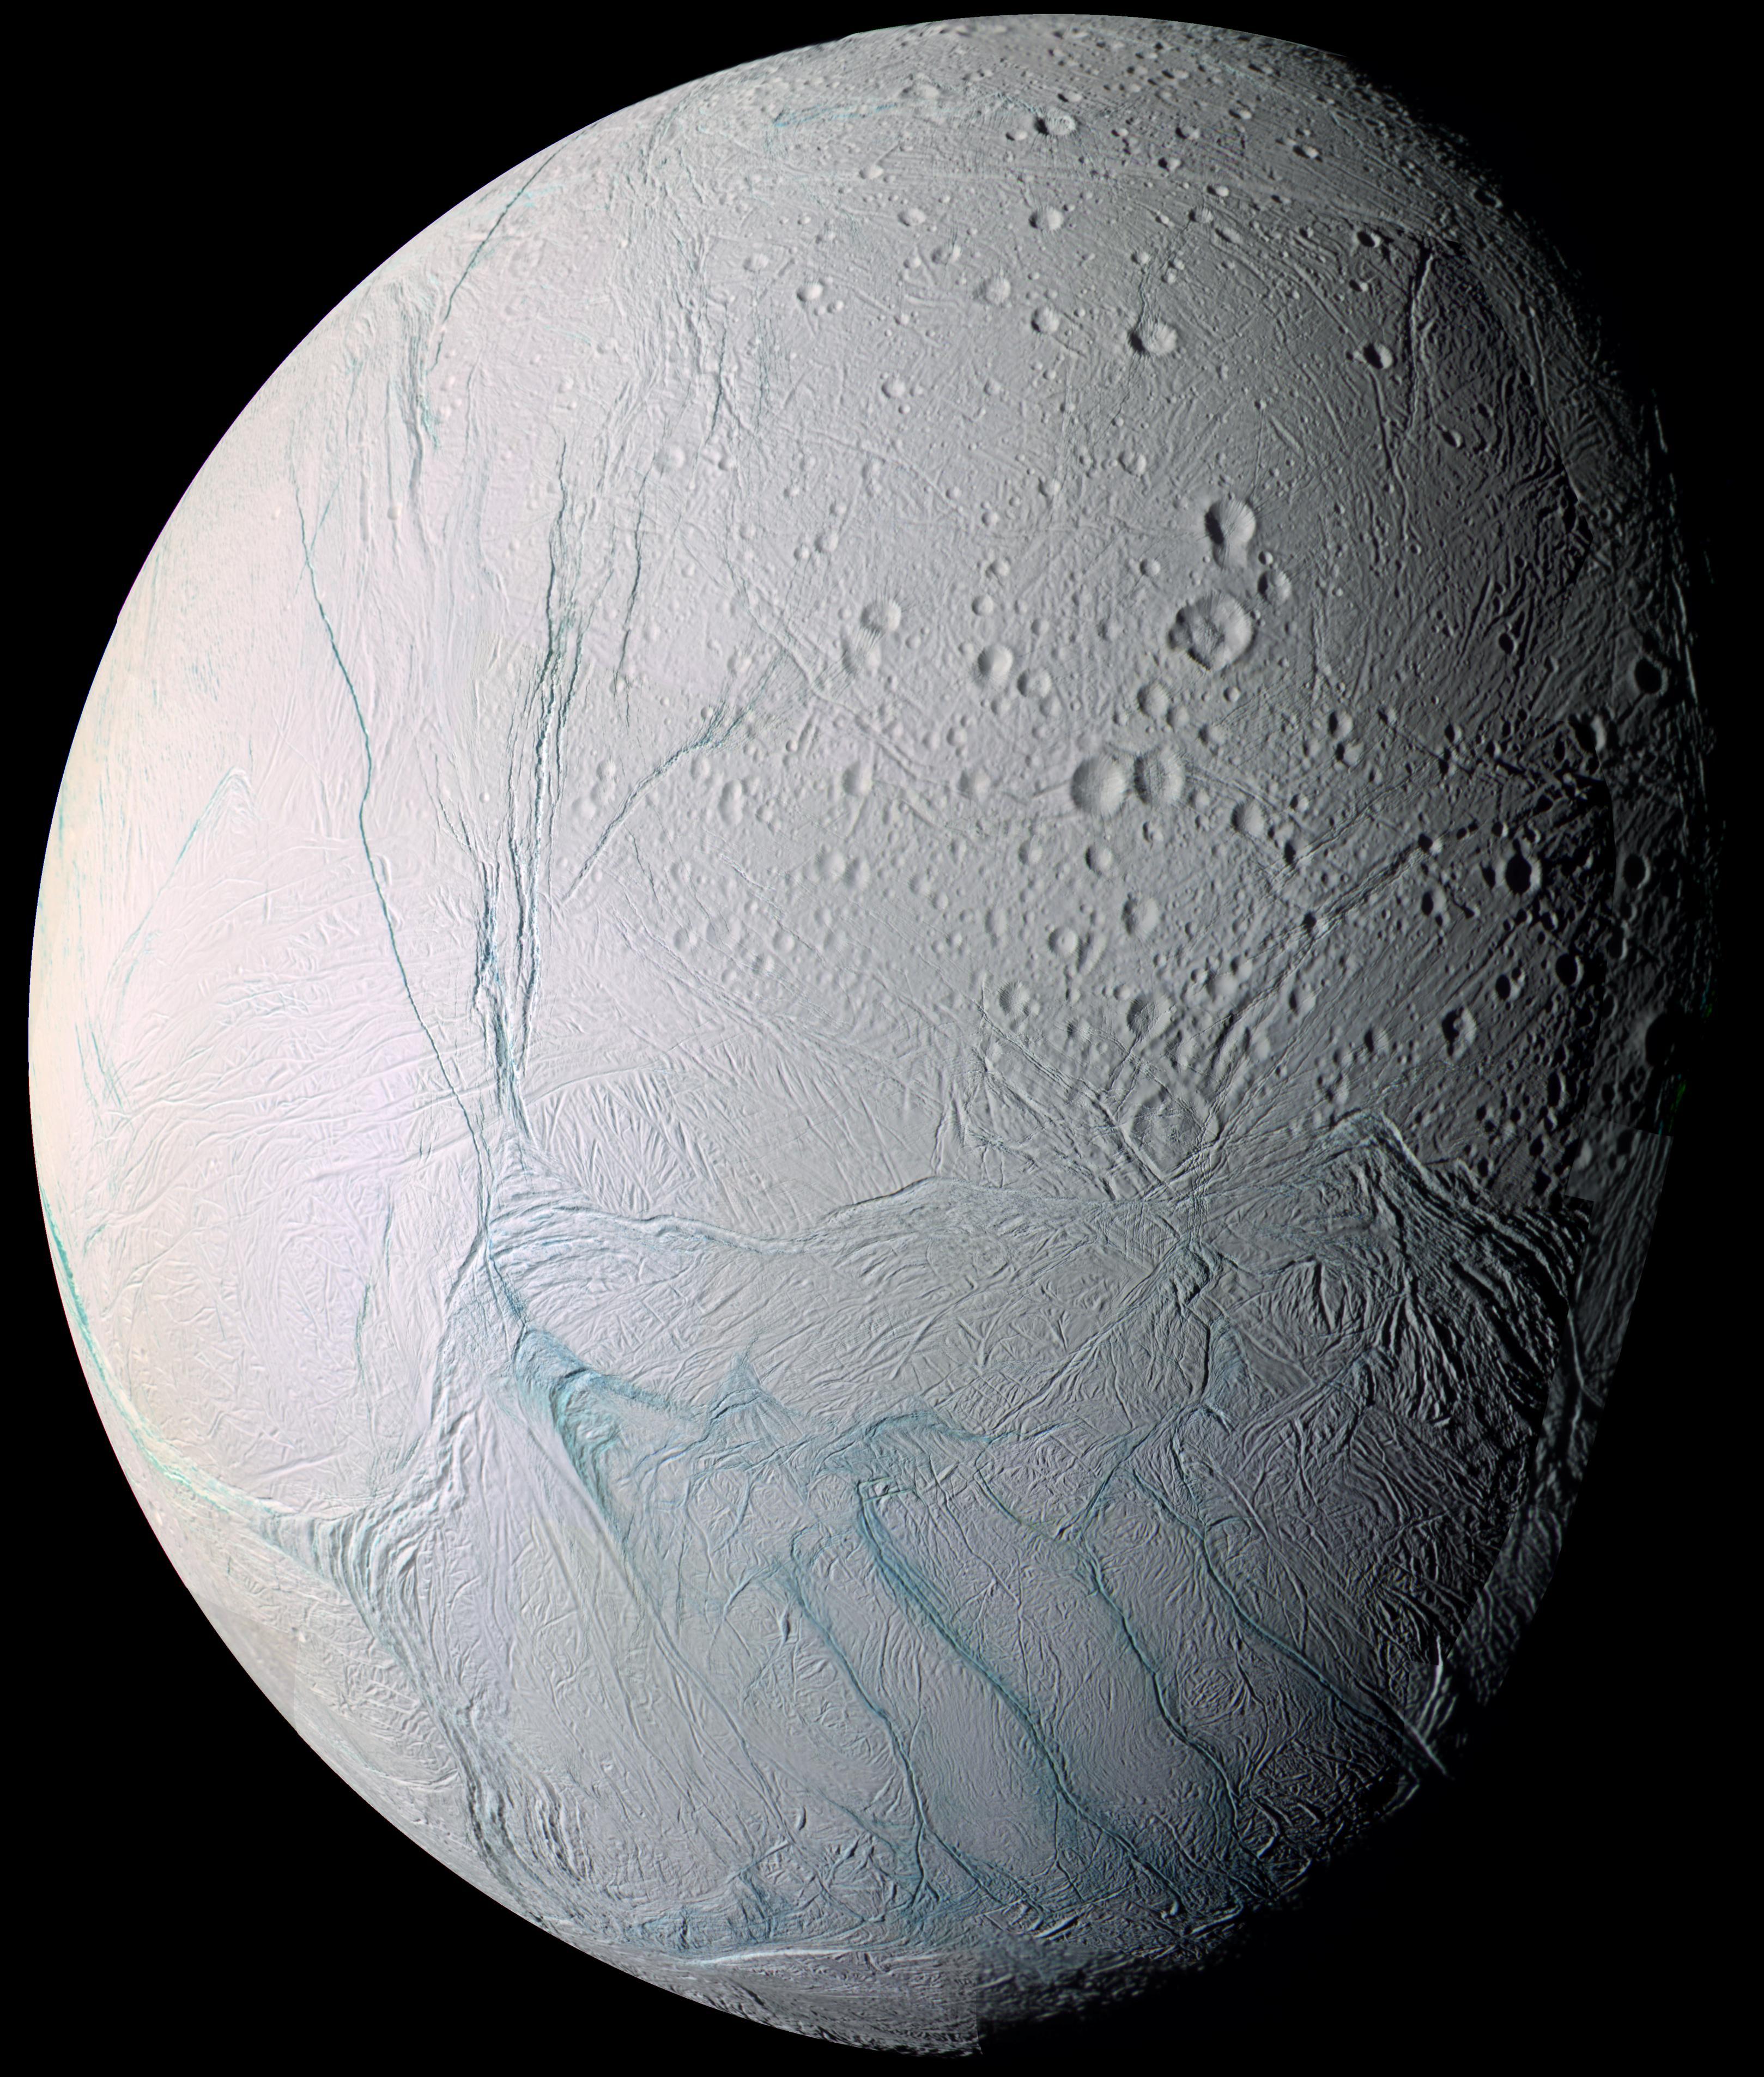 http://www.nasa.gov/images/content/176442main_enceladus_mosaic.jpg